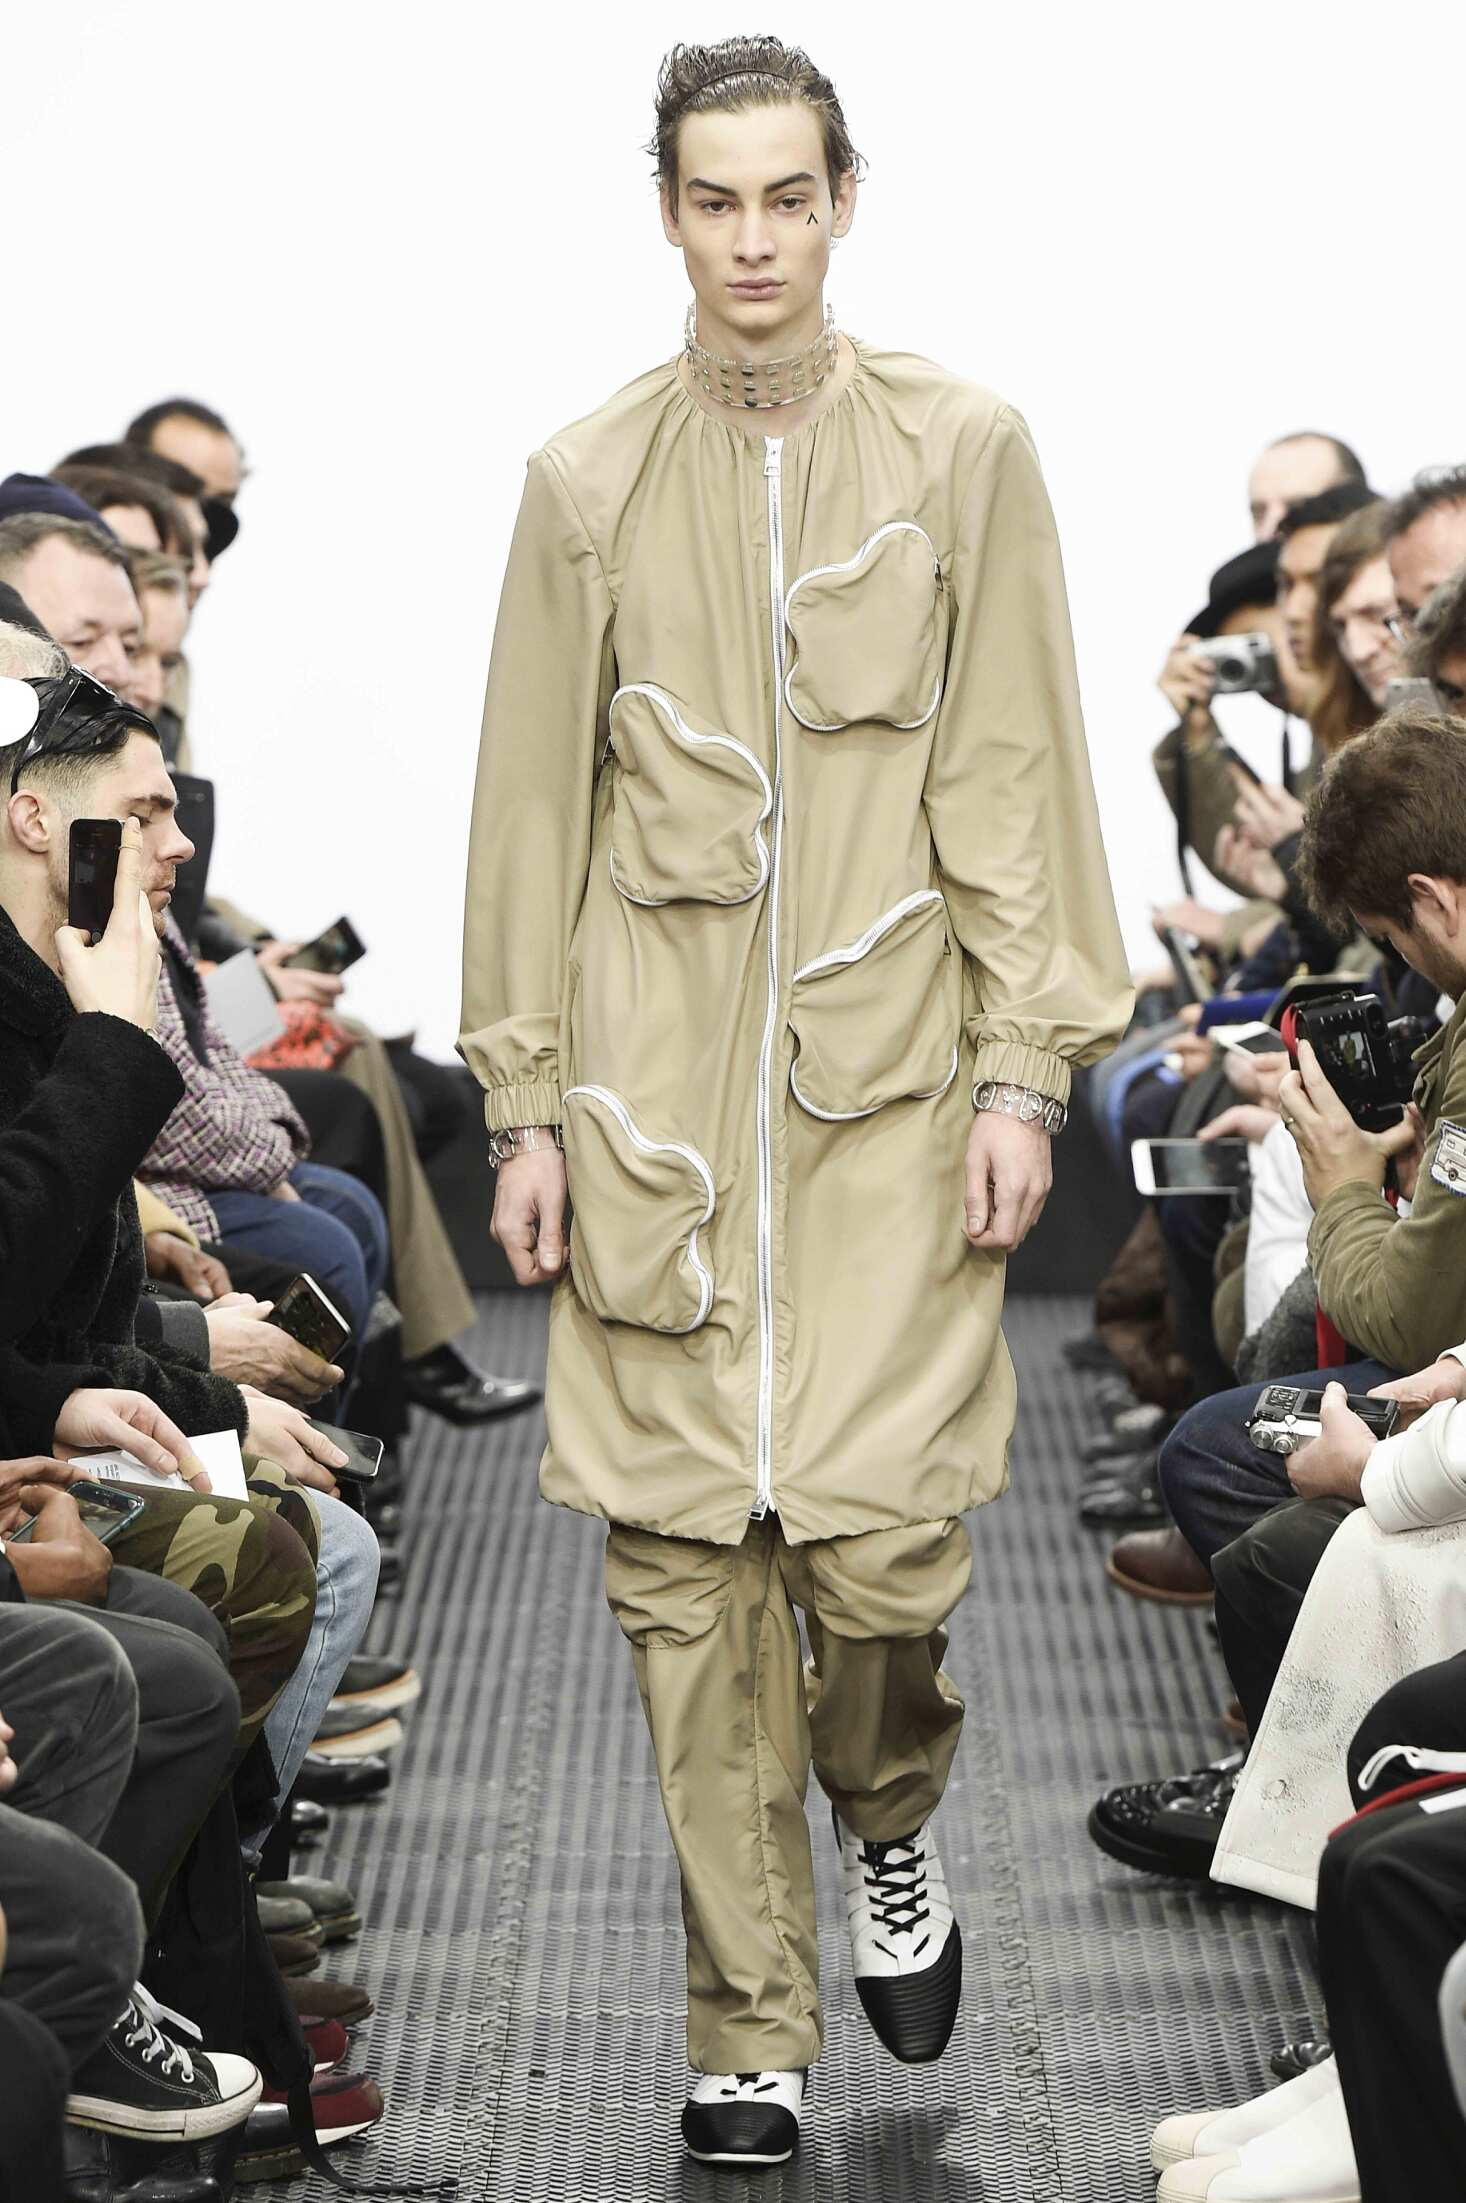 Catwalk J.W. Anderson Man Fashion Show Winter 2016